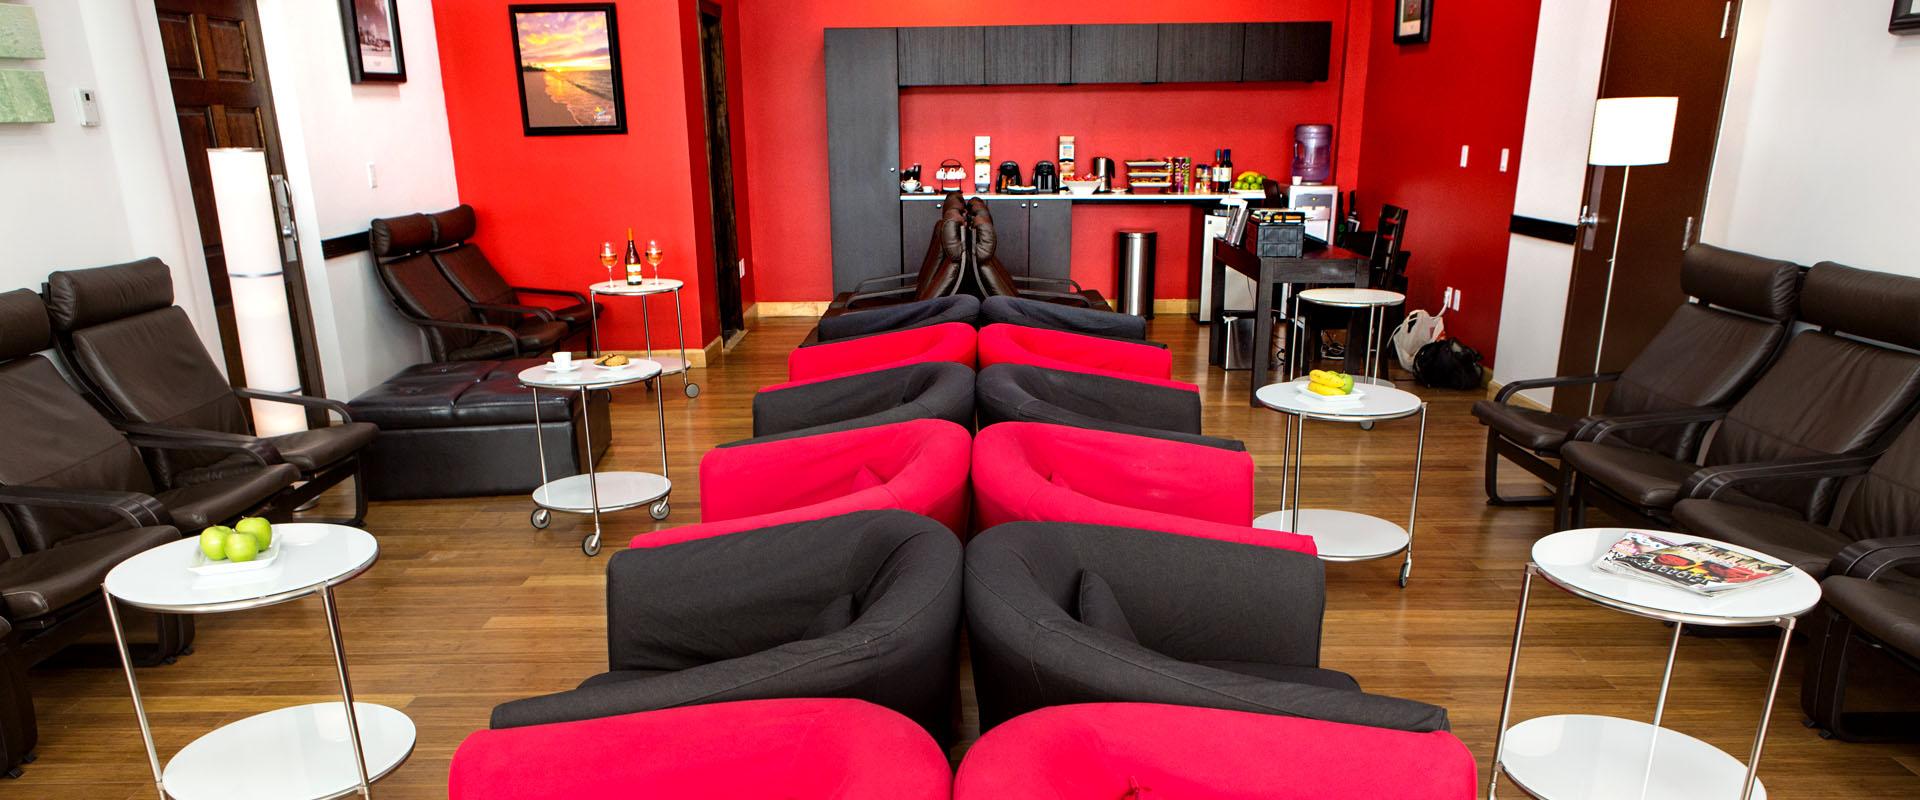 vip-lounge-3